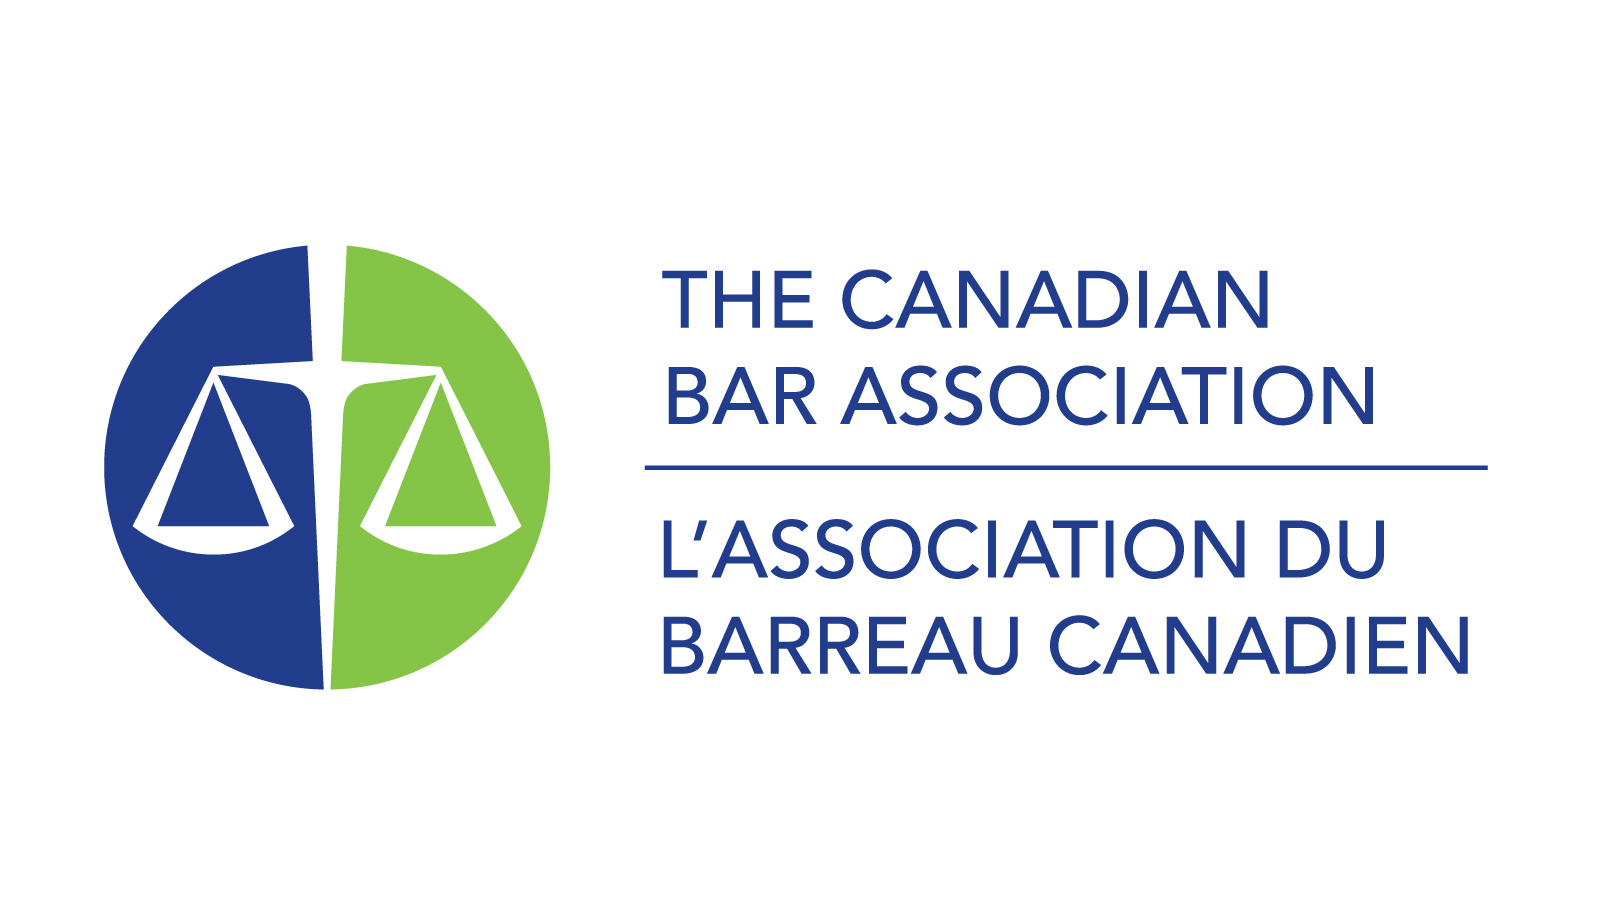 Canadian Bar Association | Brand Identity | Design